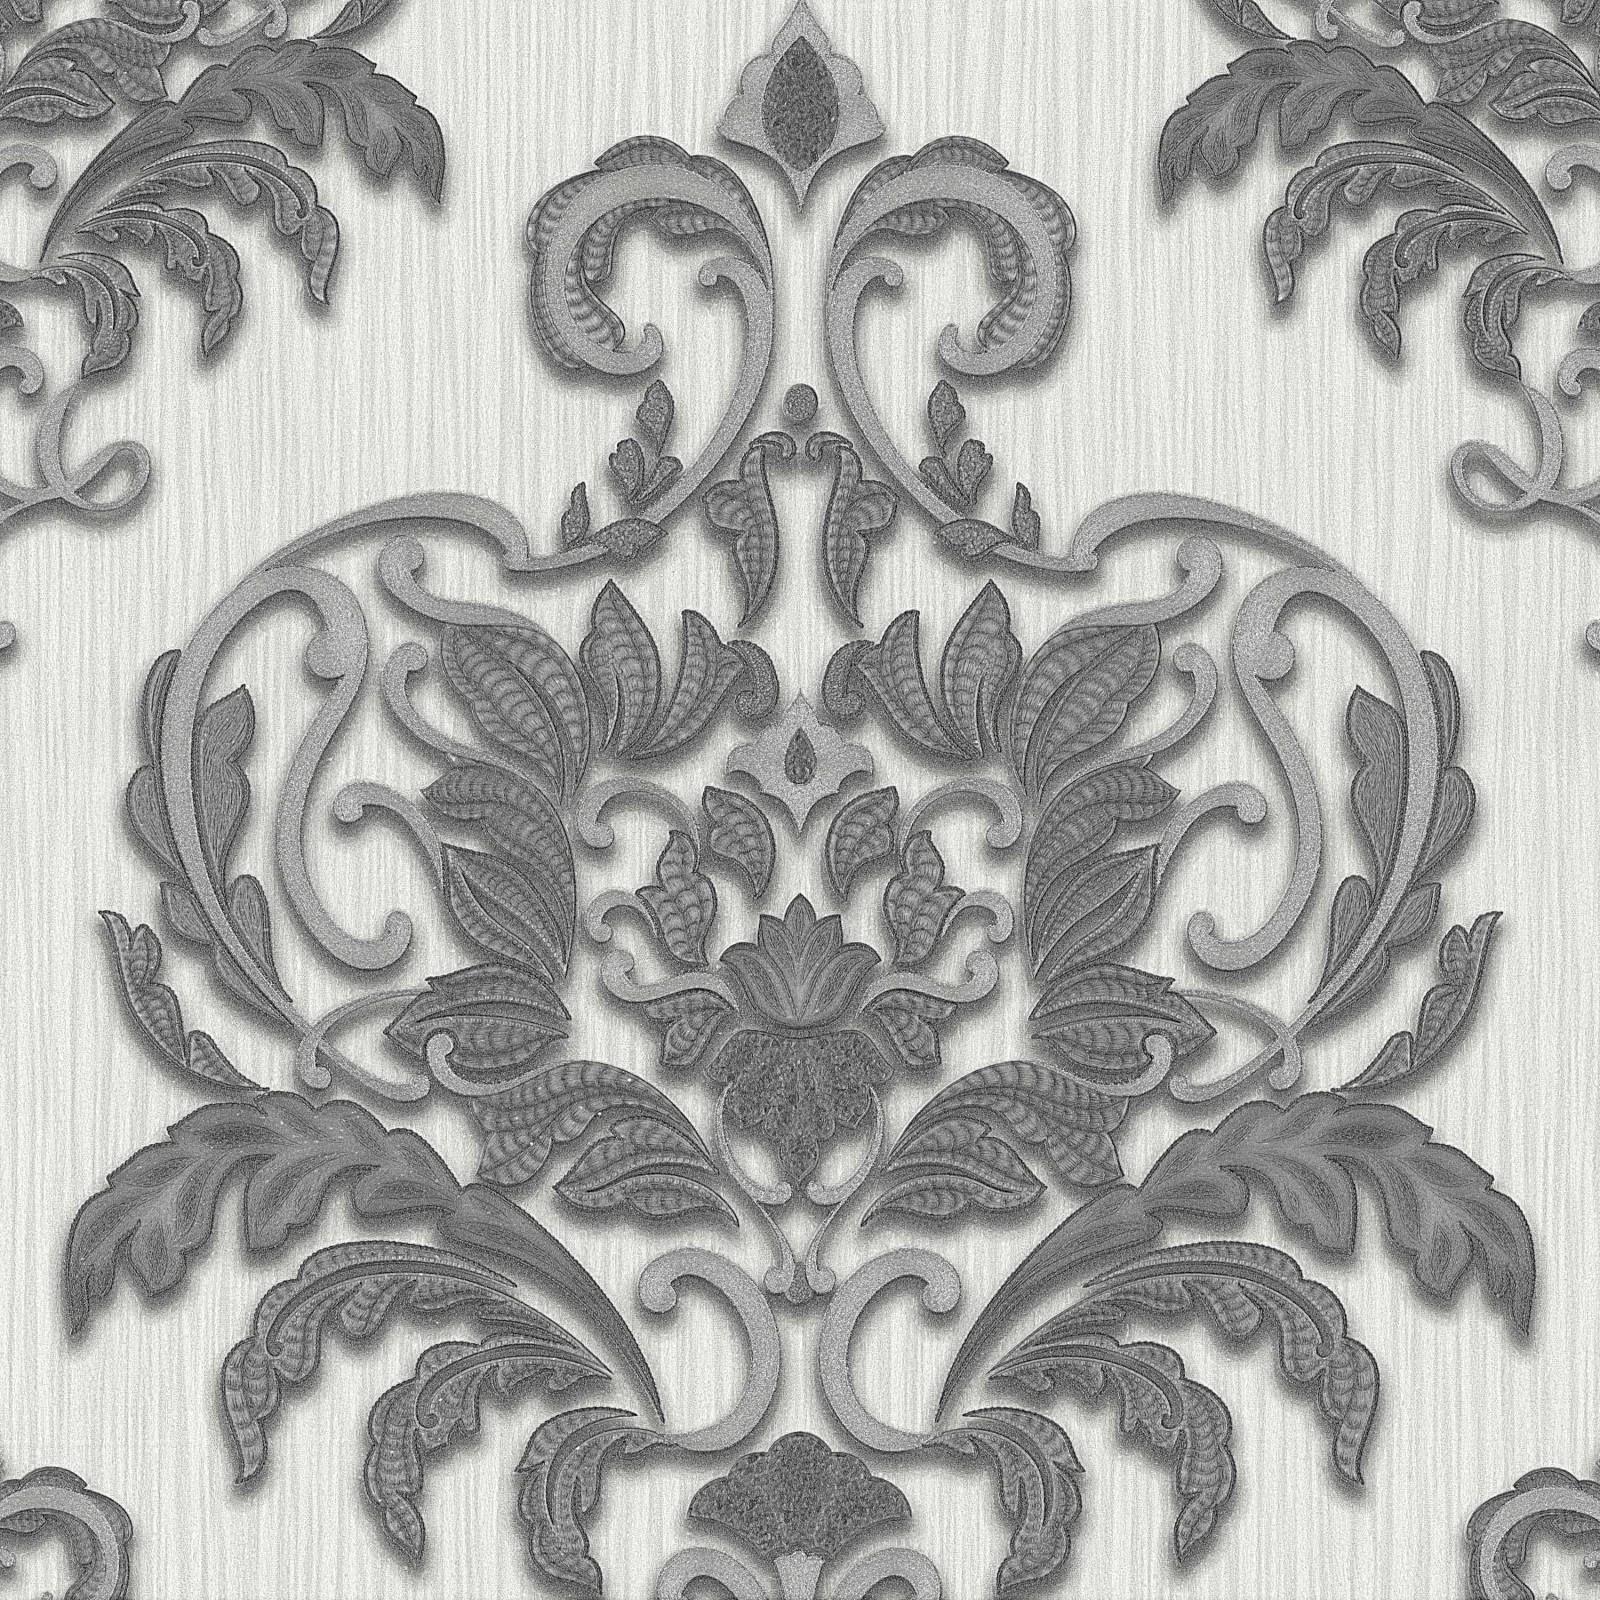 vliestapete schwarz barock dieter bohlen 02437 50. Black Bedroom Furniture Sets. Home Design Ideas